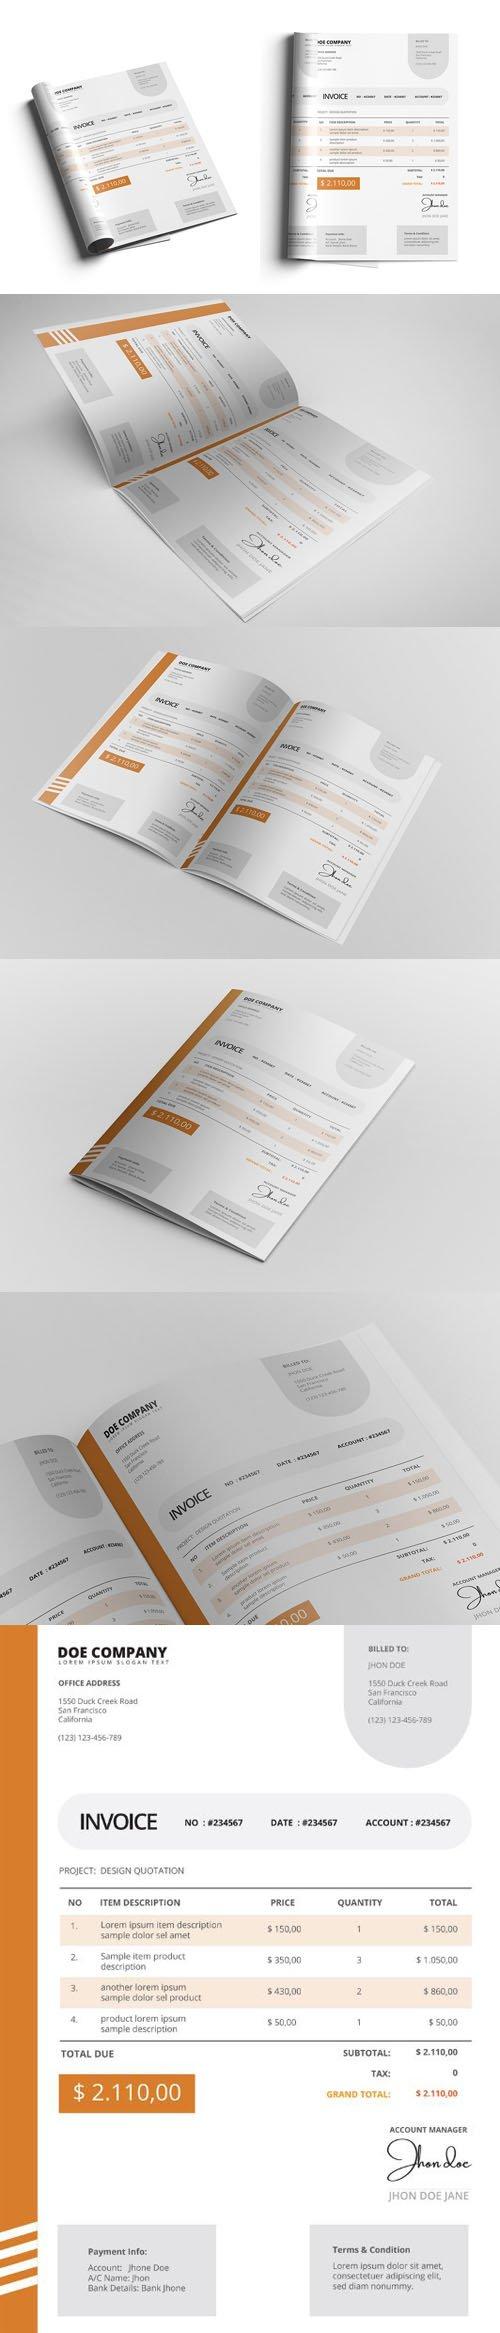 Company Invoice Template in Vector